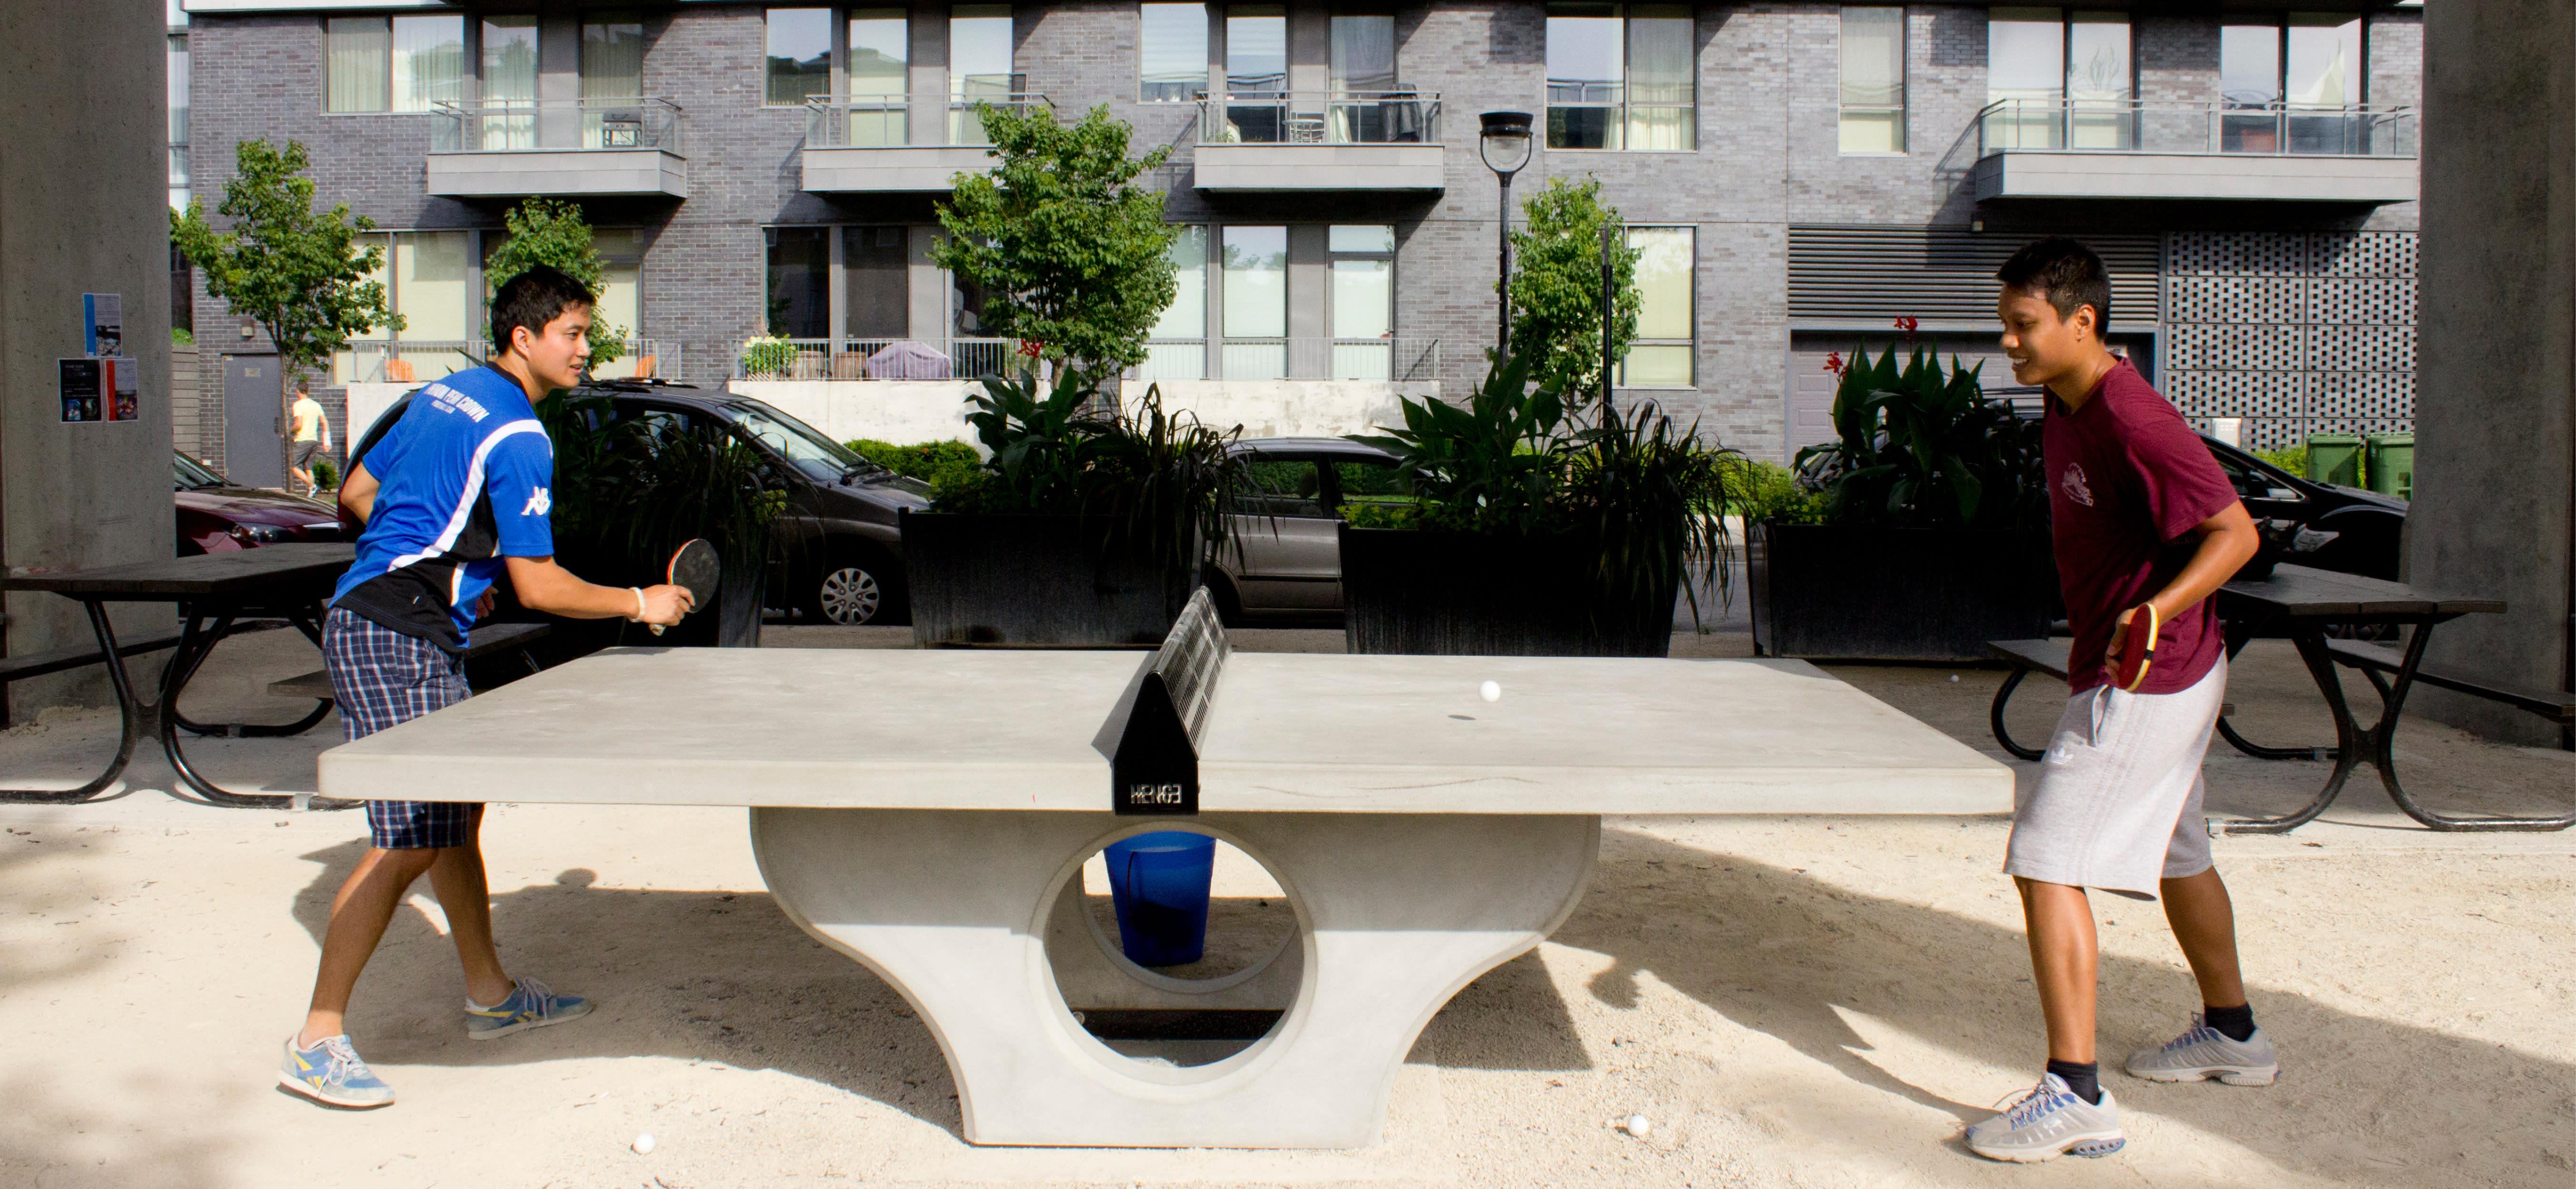 Ping-pong à L'Espace Faubourg Québec